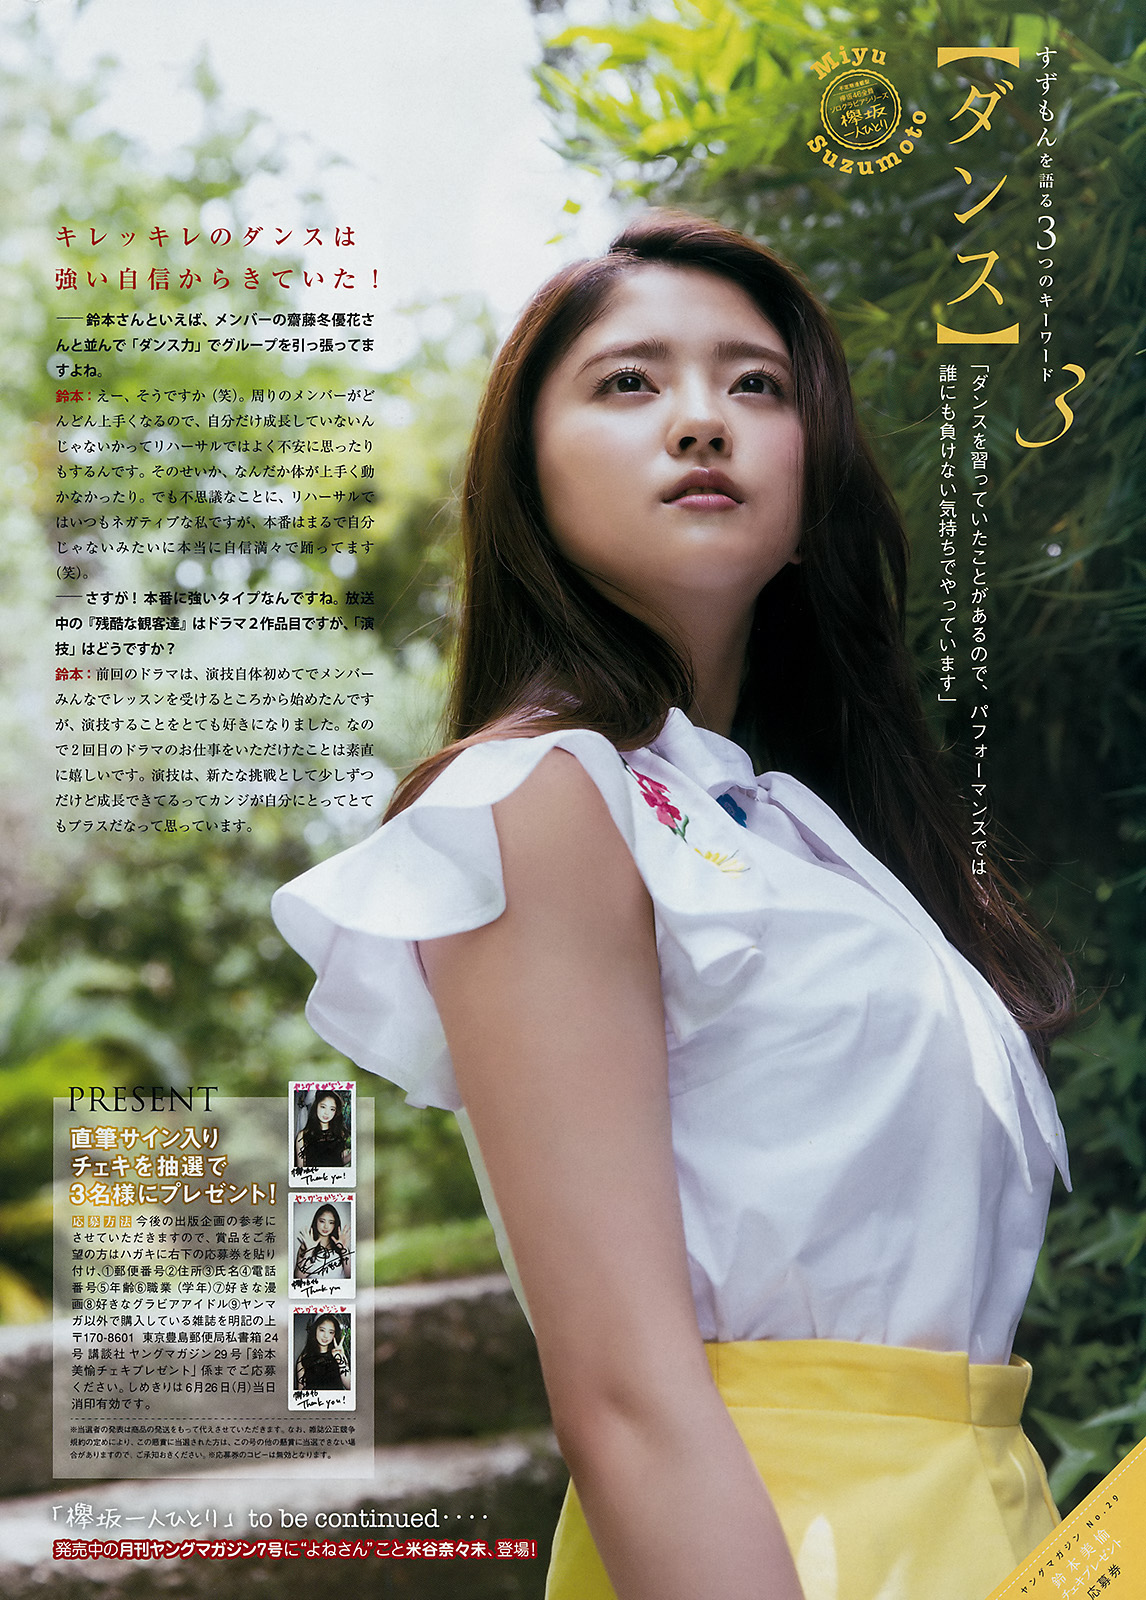 Suzumoto Miyu 鈴本美愉 Keyakizaka46, Young Magazine 2017.07.03 No.29 (週刊ヤングマガジン 2017年29号)